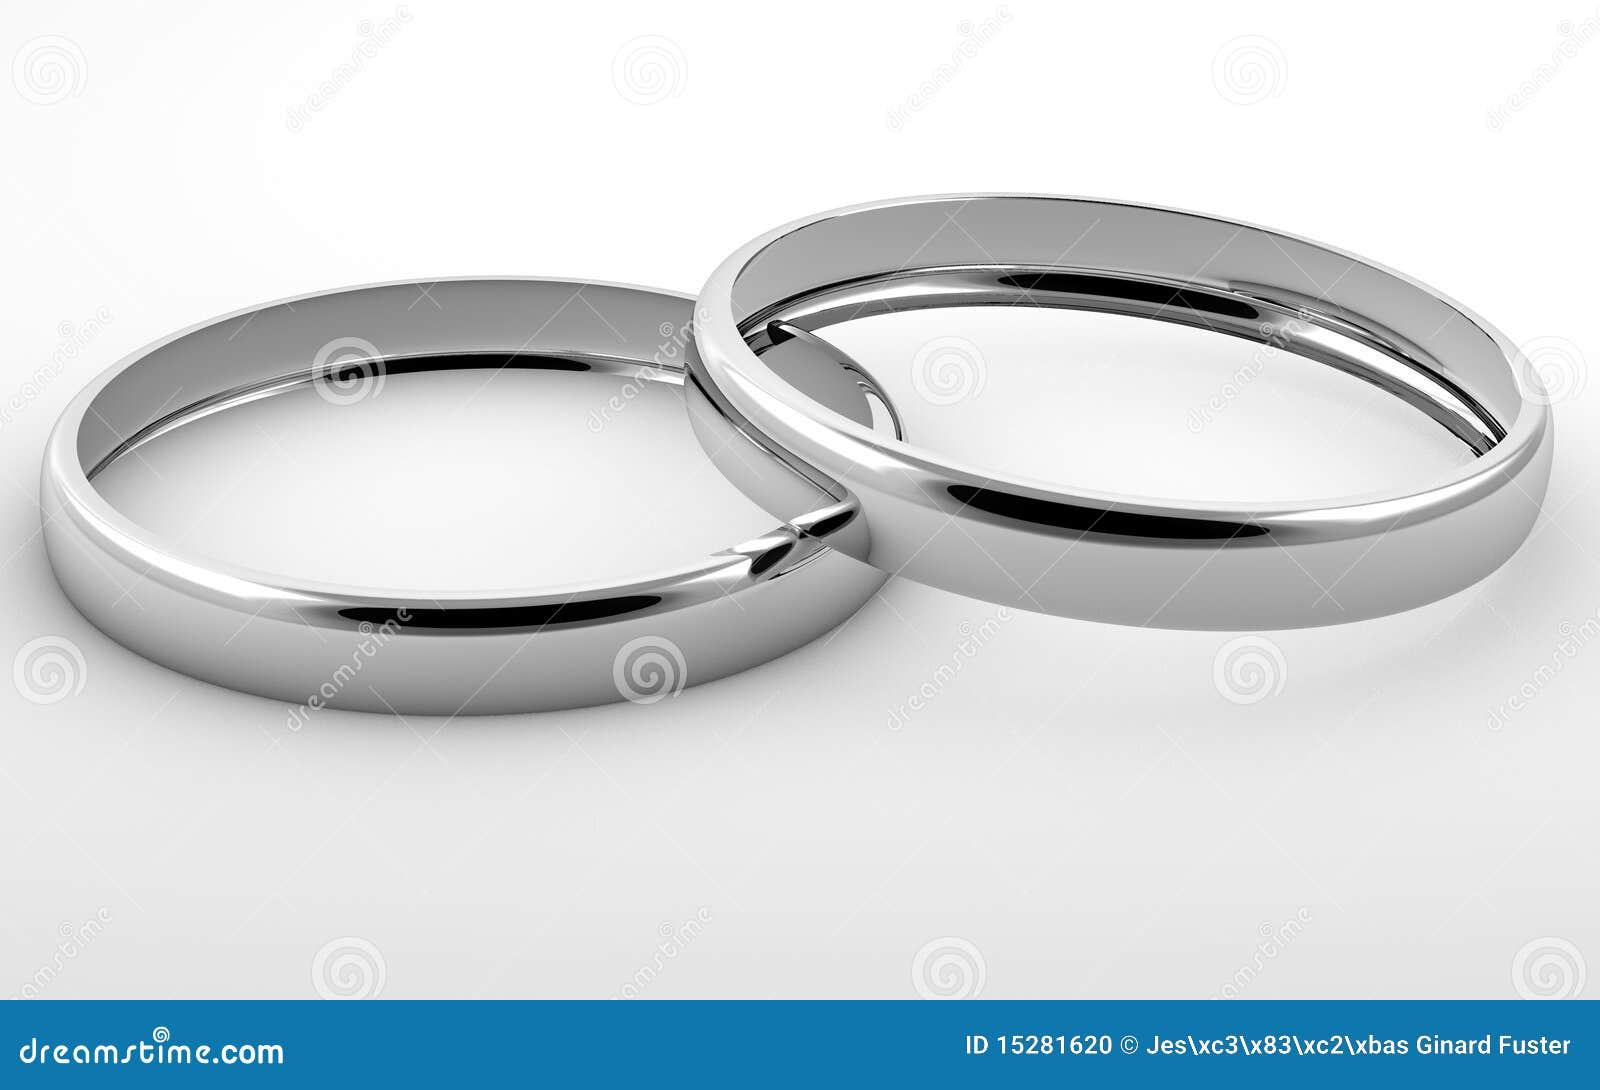 Zwei silberne Ringe